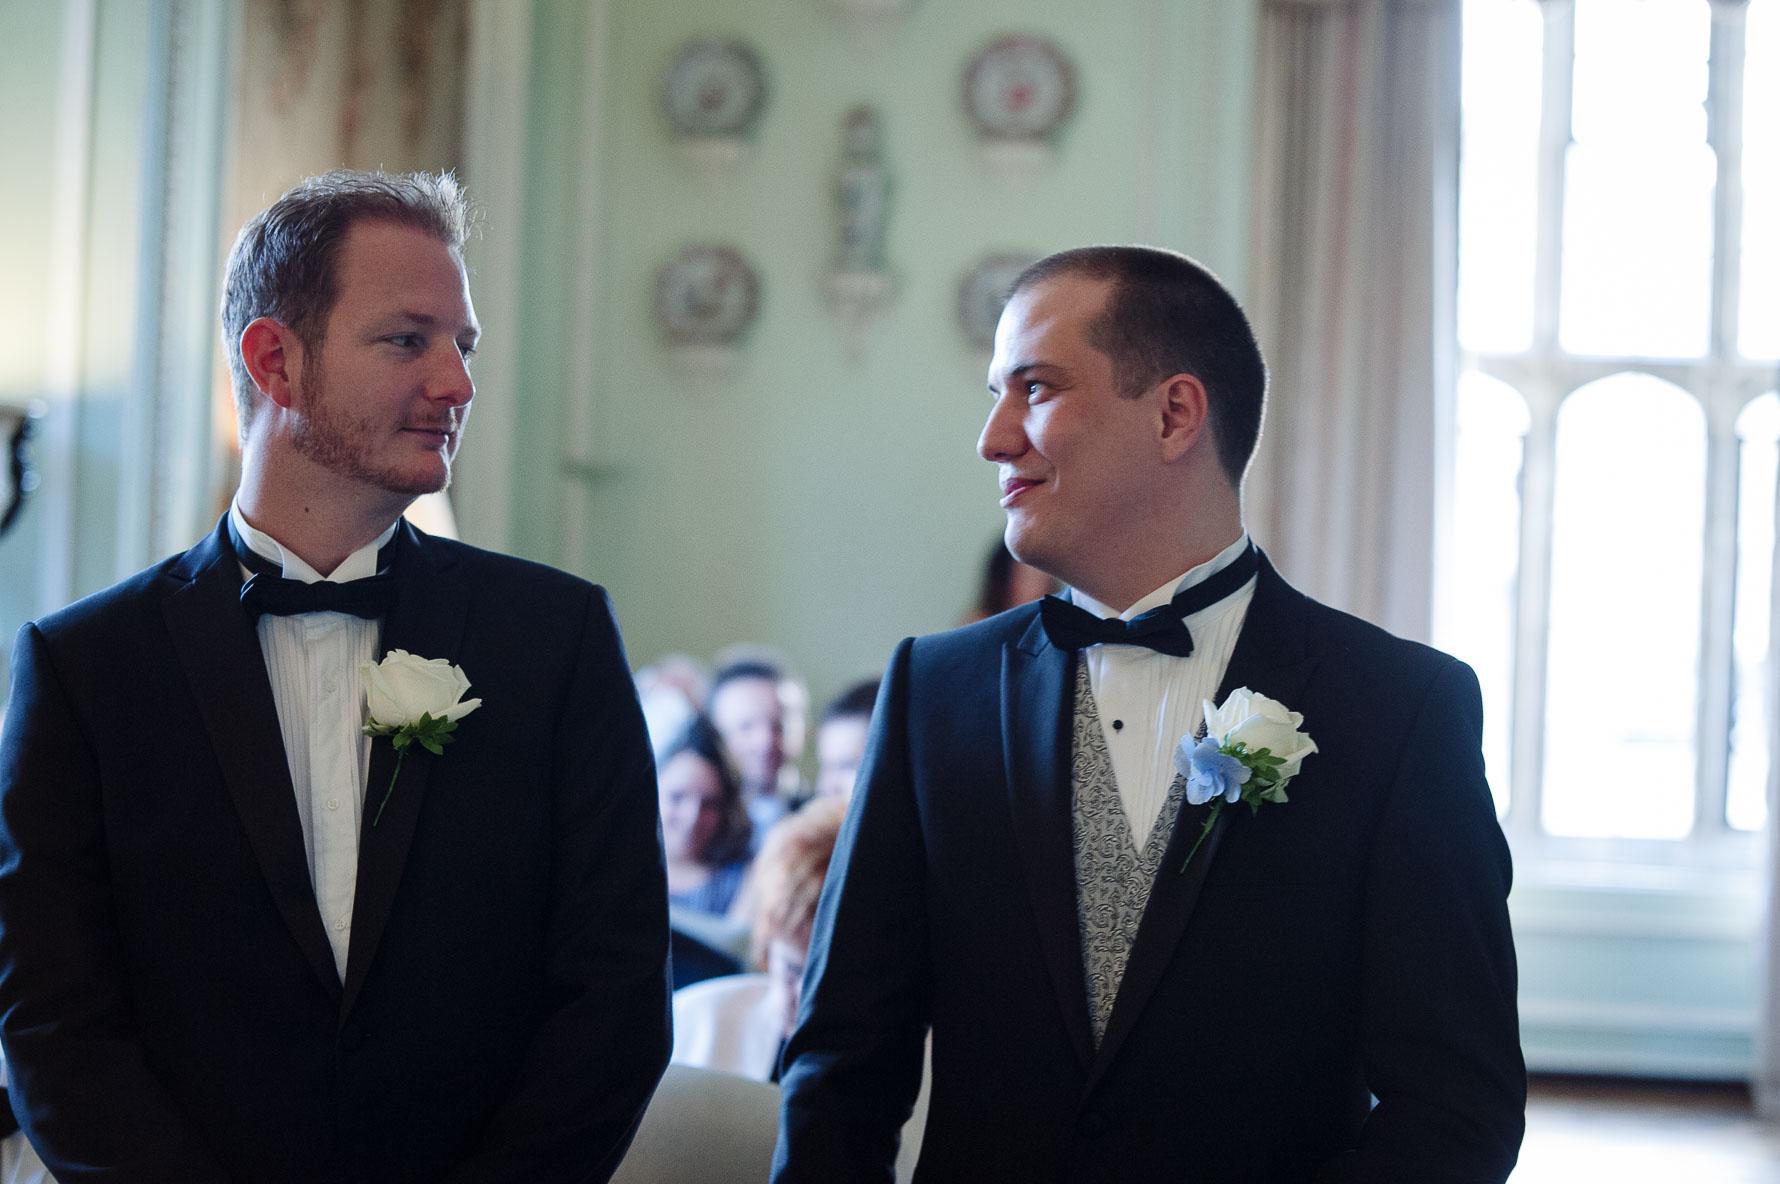 Leeds Castle Wedding13-20140919 0409